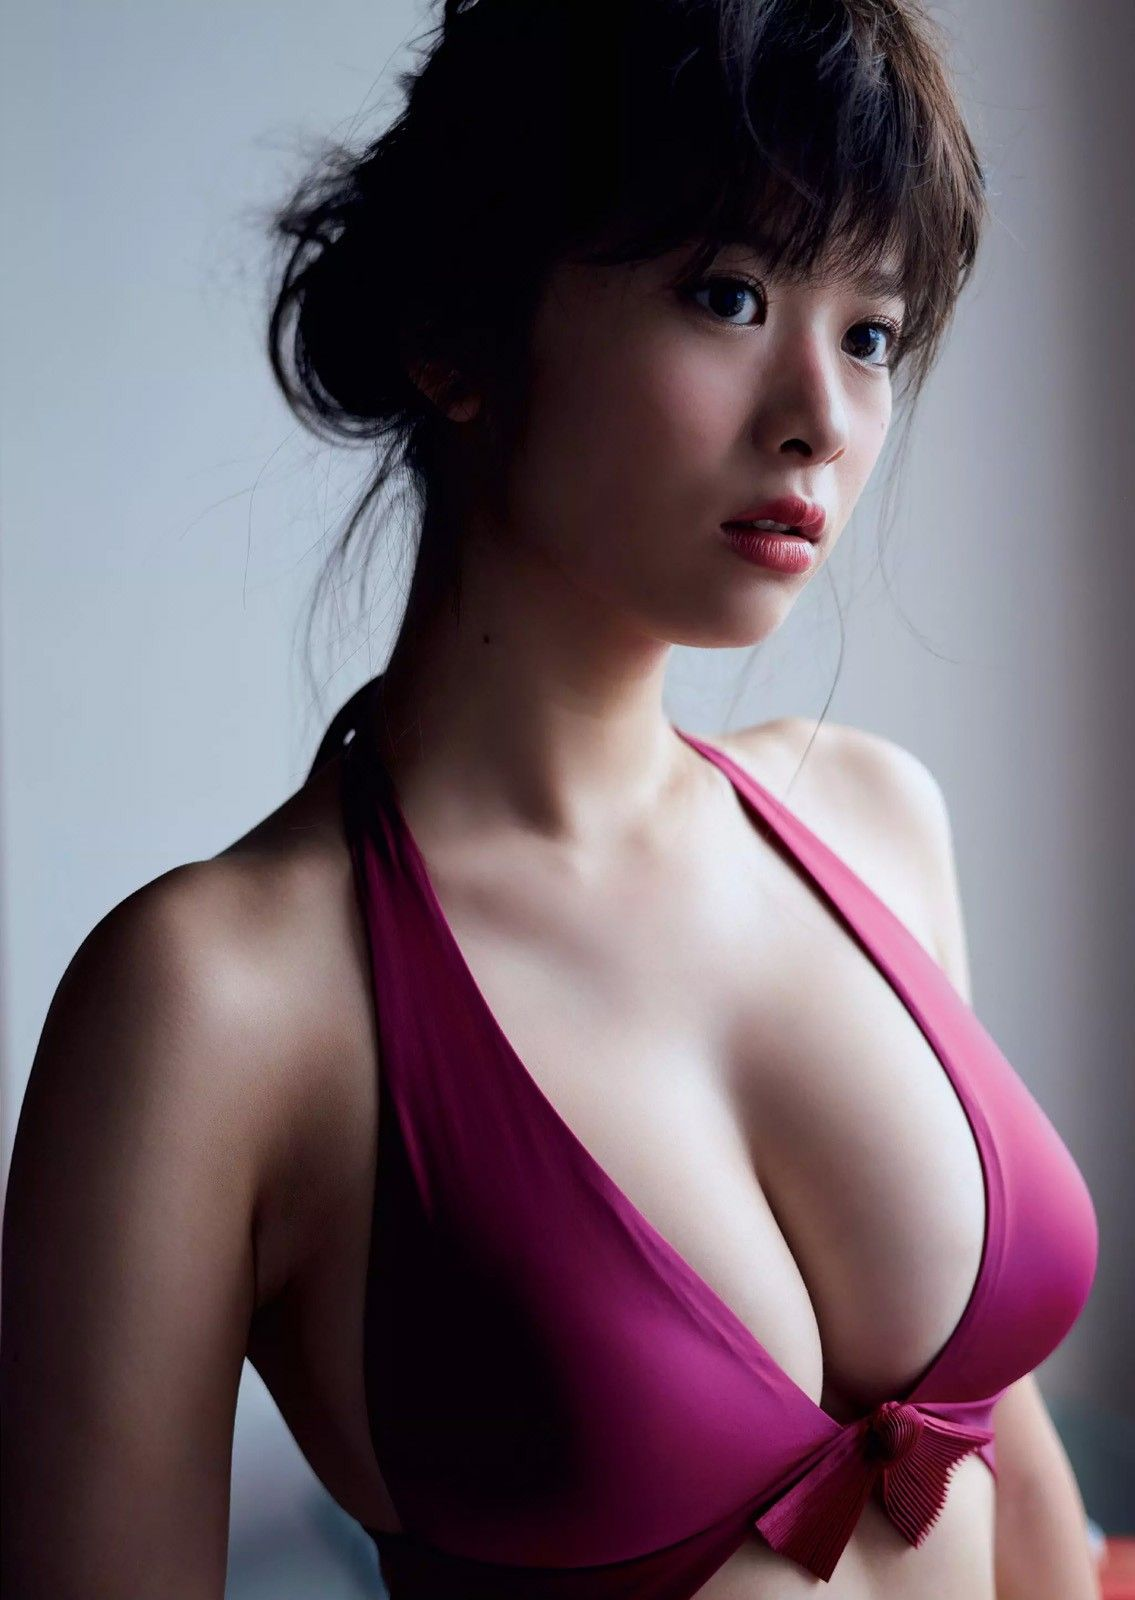 Bikini Anastacia McPherson nudes (56 foto and video), Pussy, Is a cute, Boobs, butt 2020